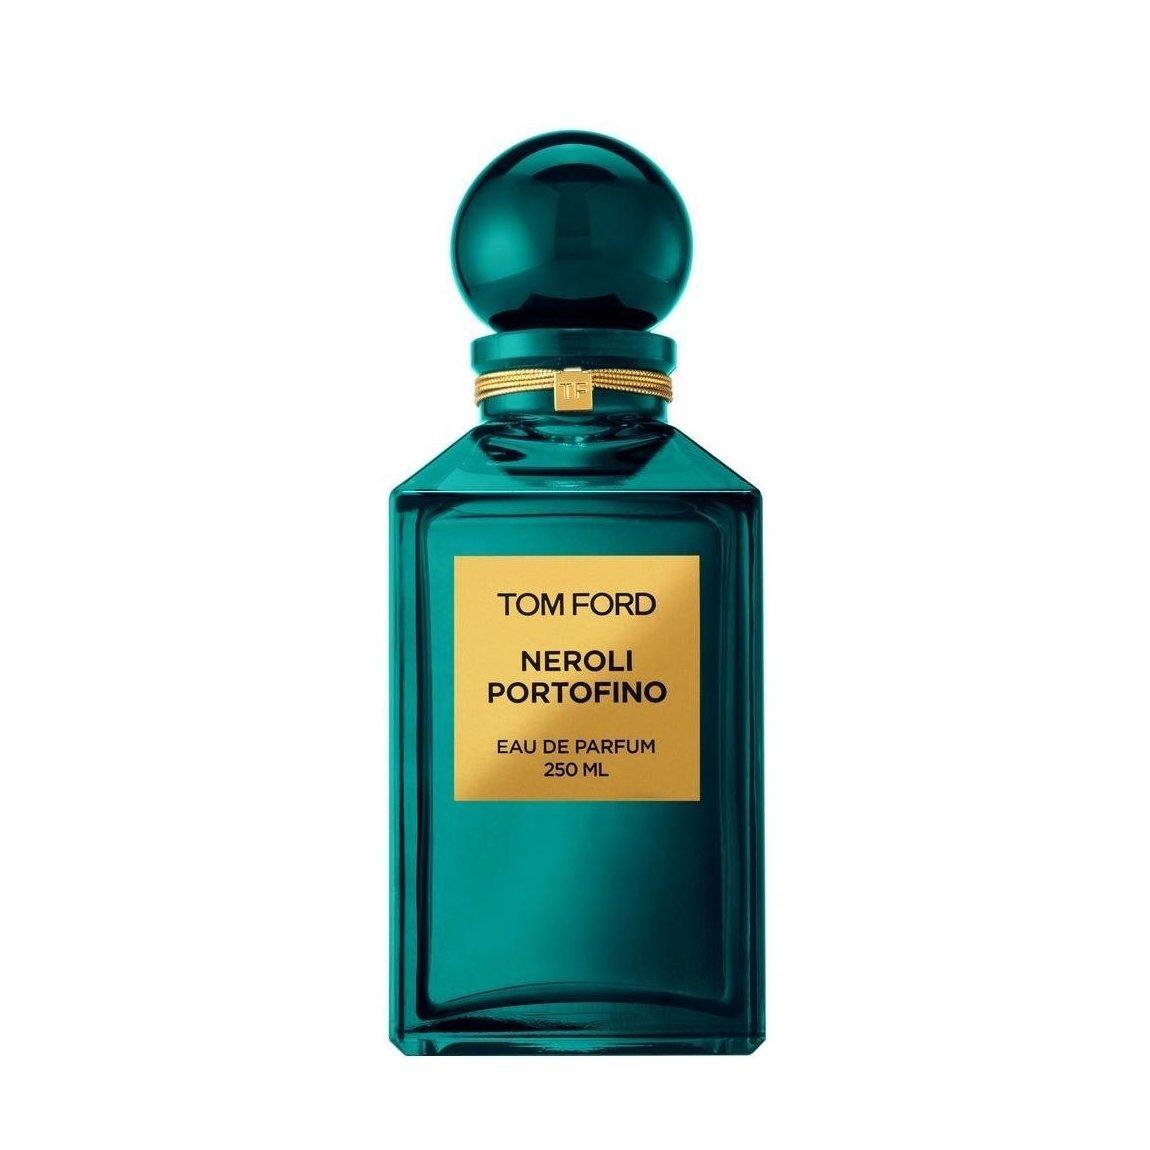 TOM FORD Neroli Portofino 250 ml product swatch.